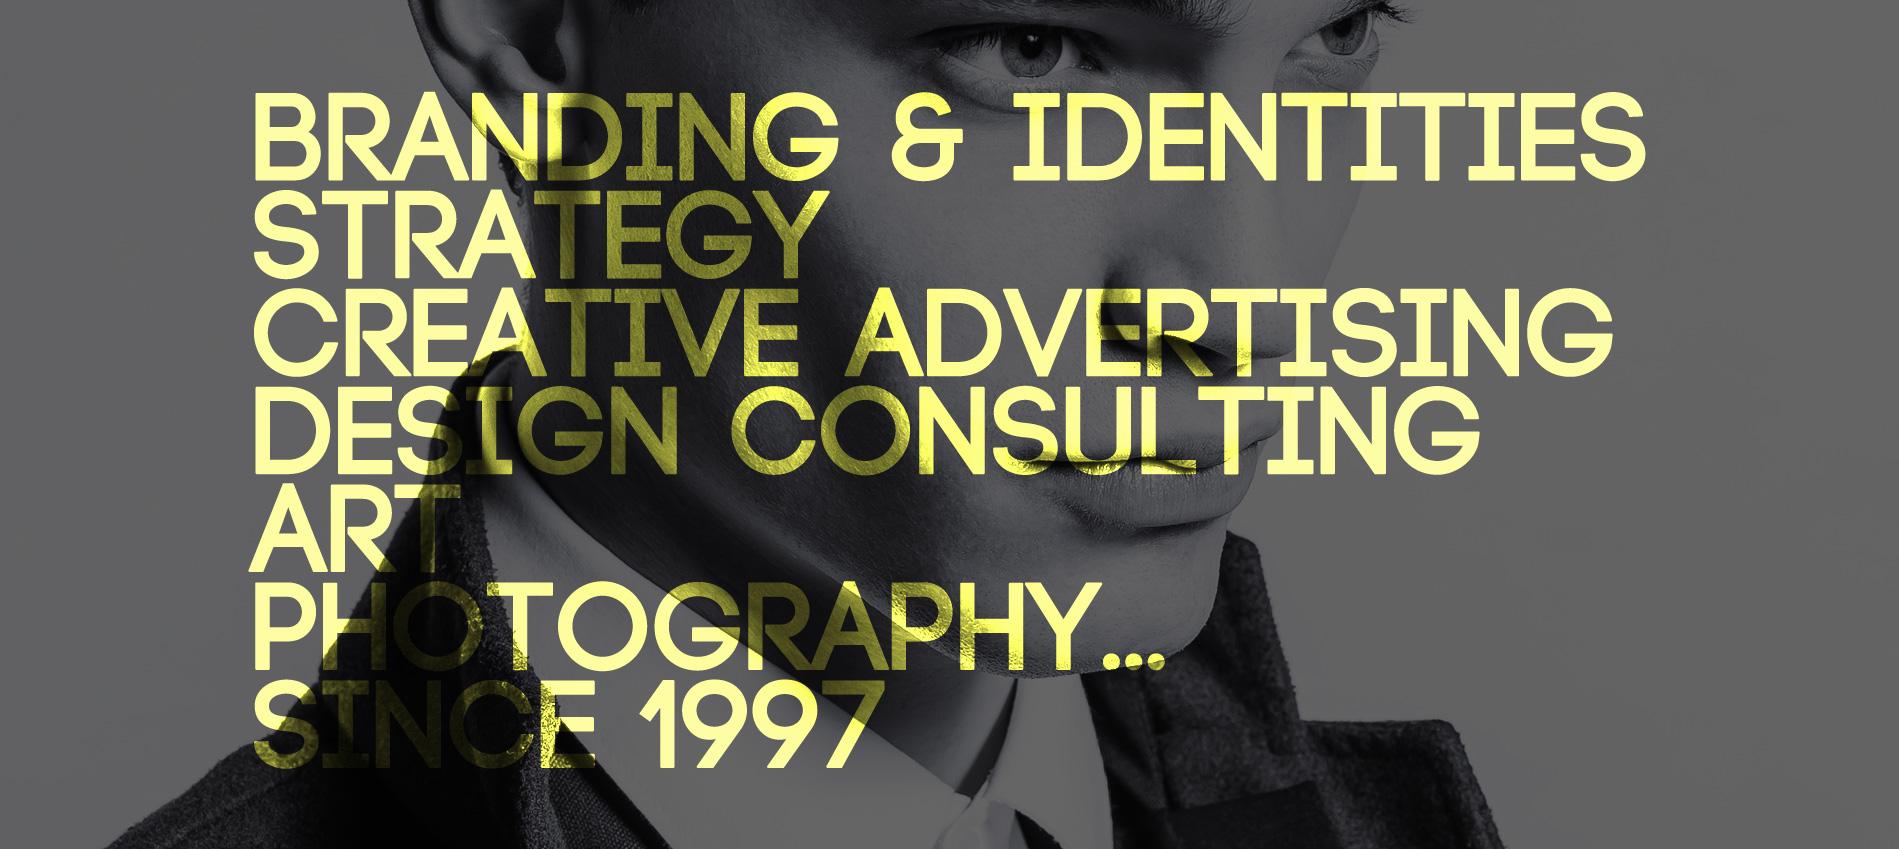 Branding, Identities, Design, Consulting, Art, Photography